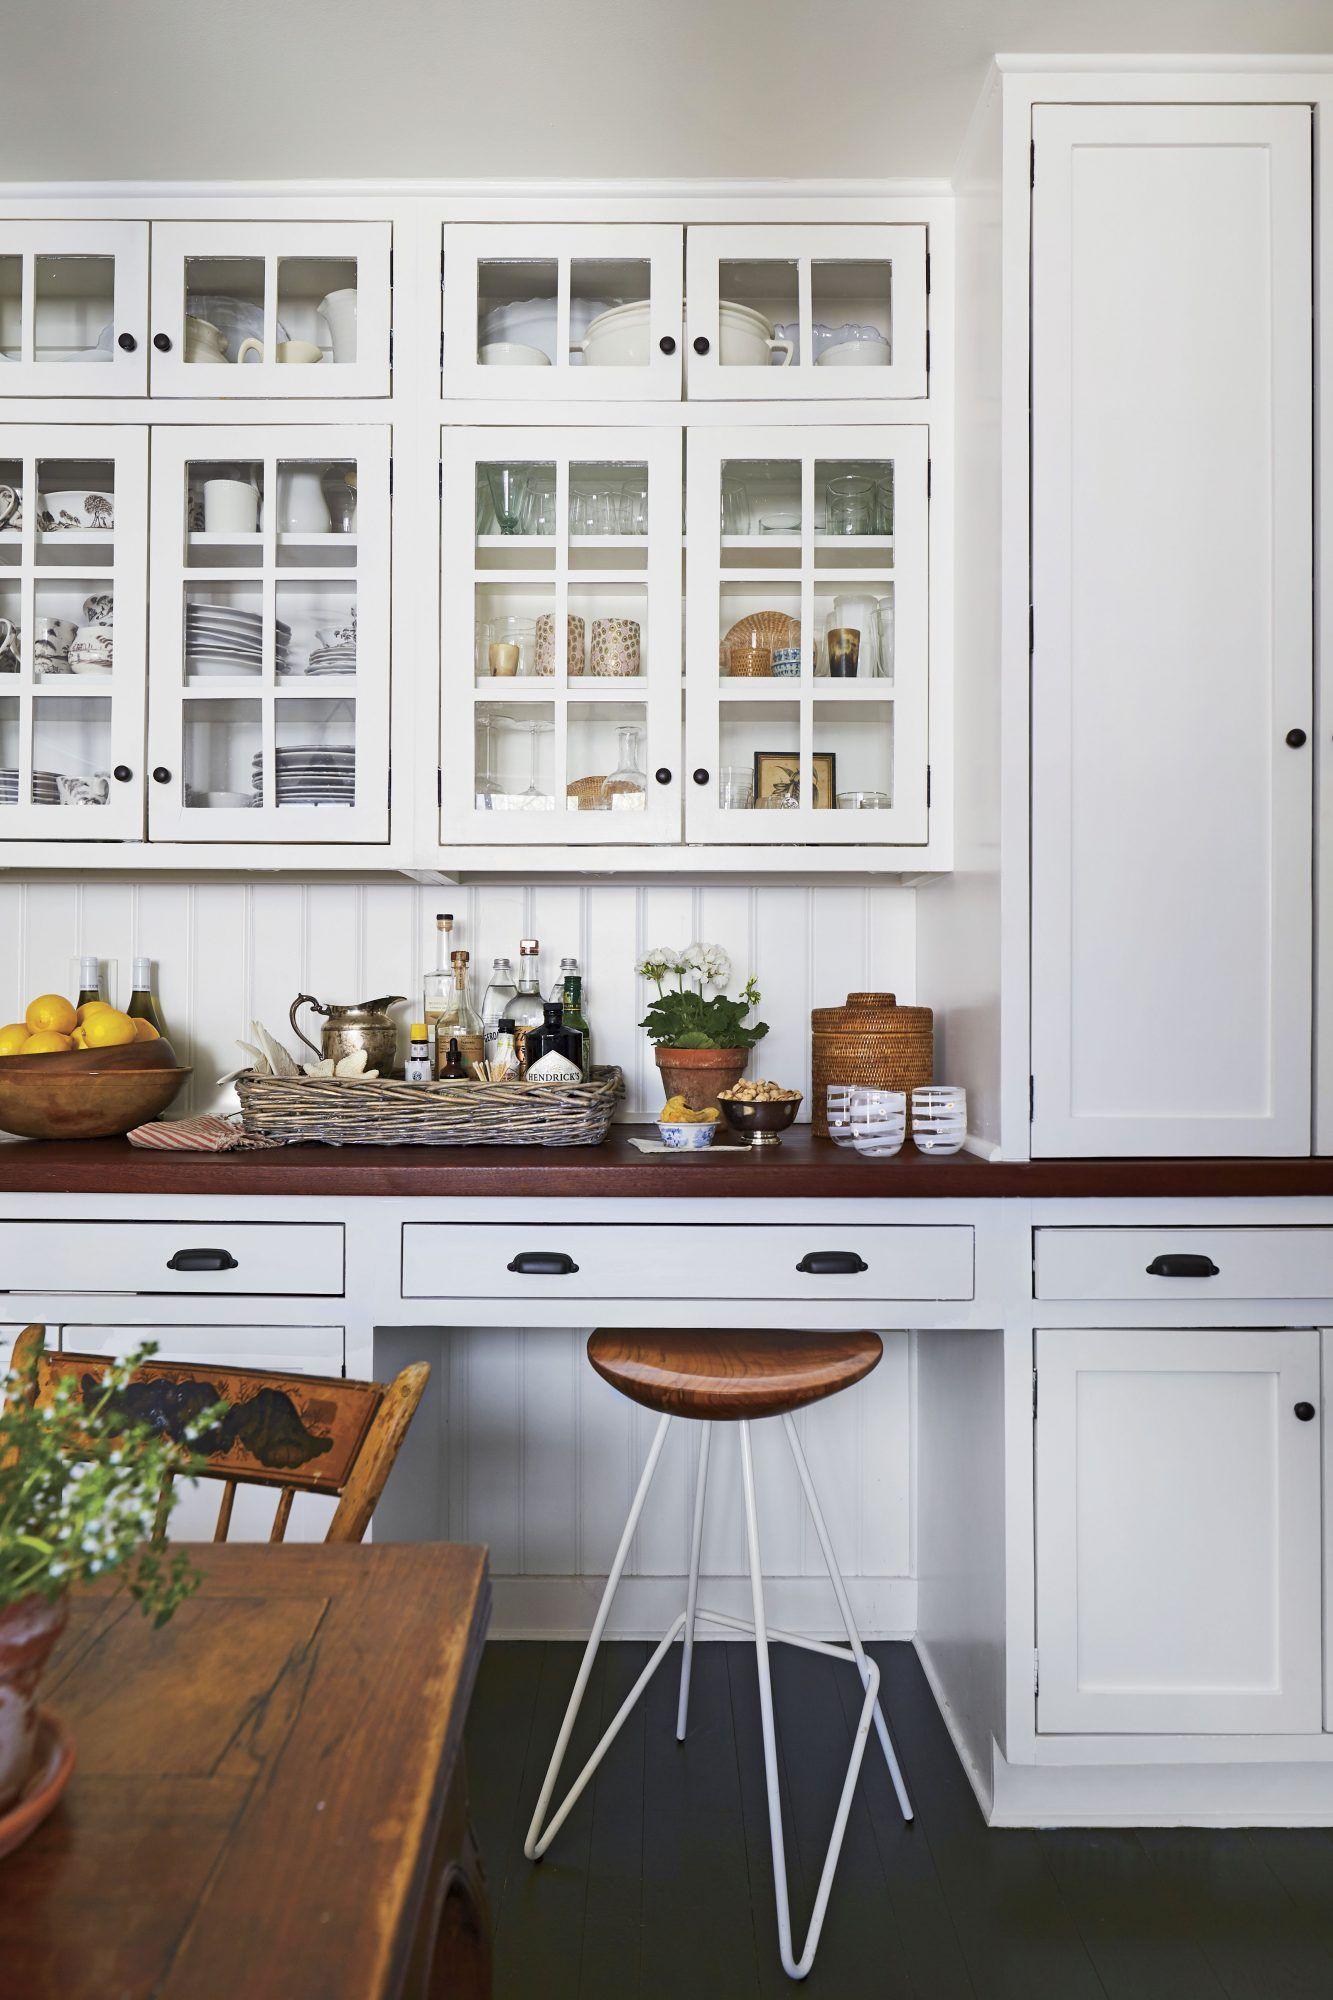 45 Farmhouse Decor Ideas For Your Southern Home White Cabinetry Farmhouse Kitchen Kitchen Design